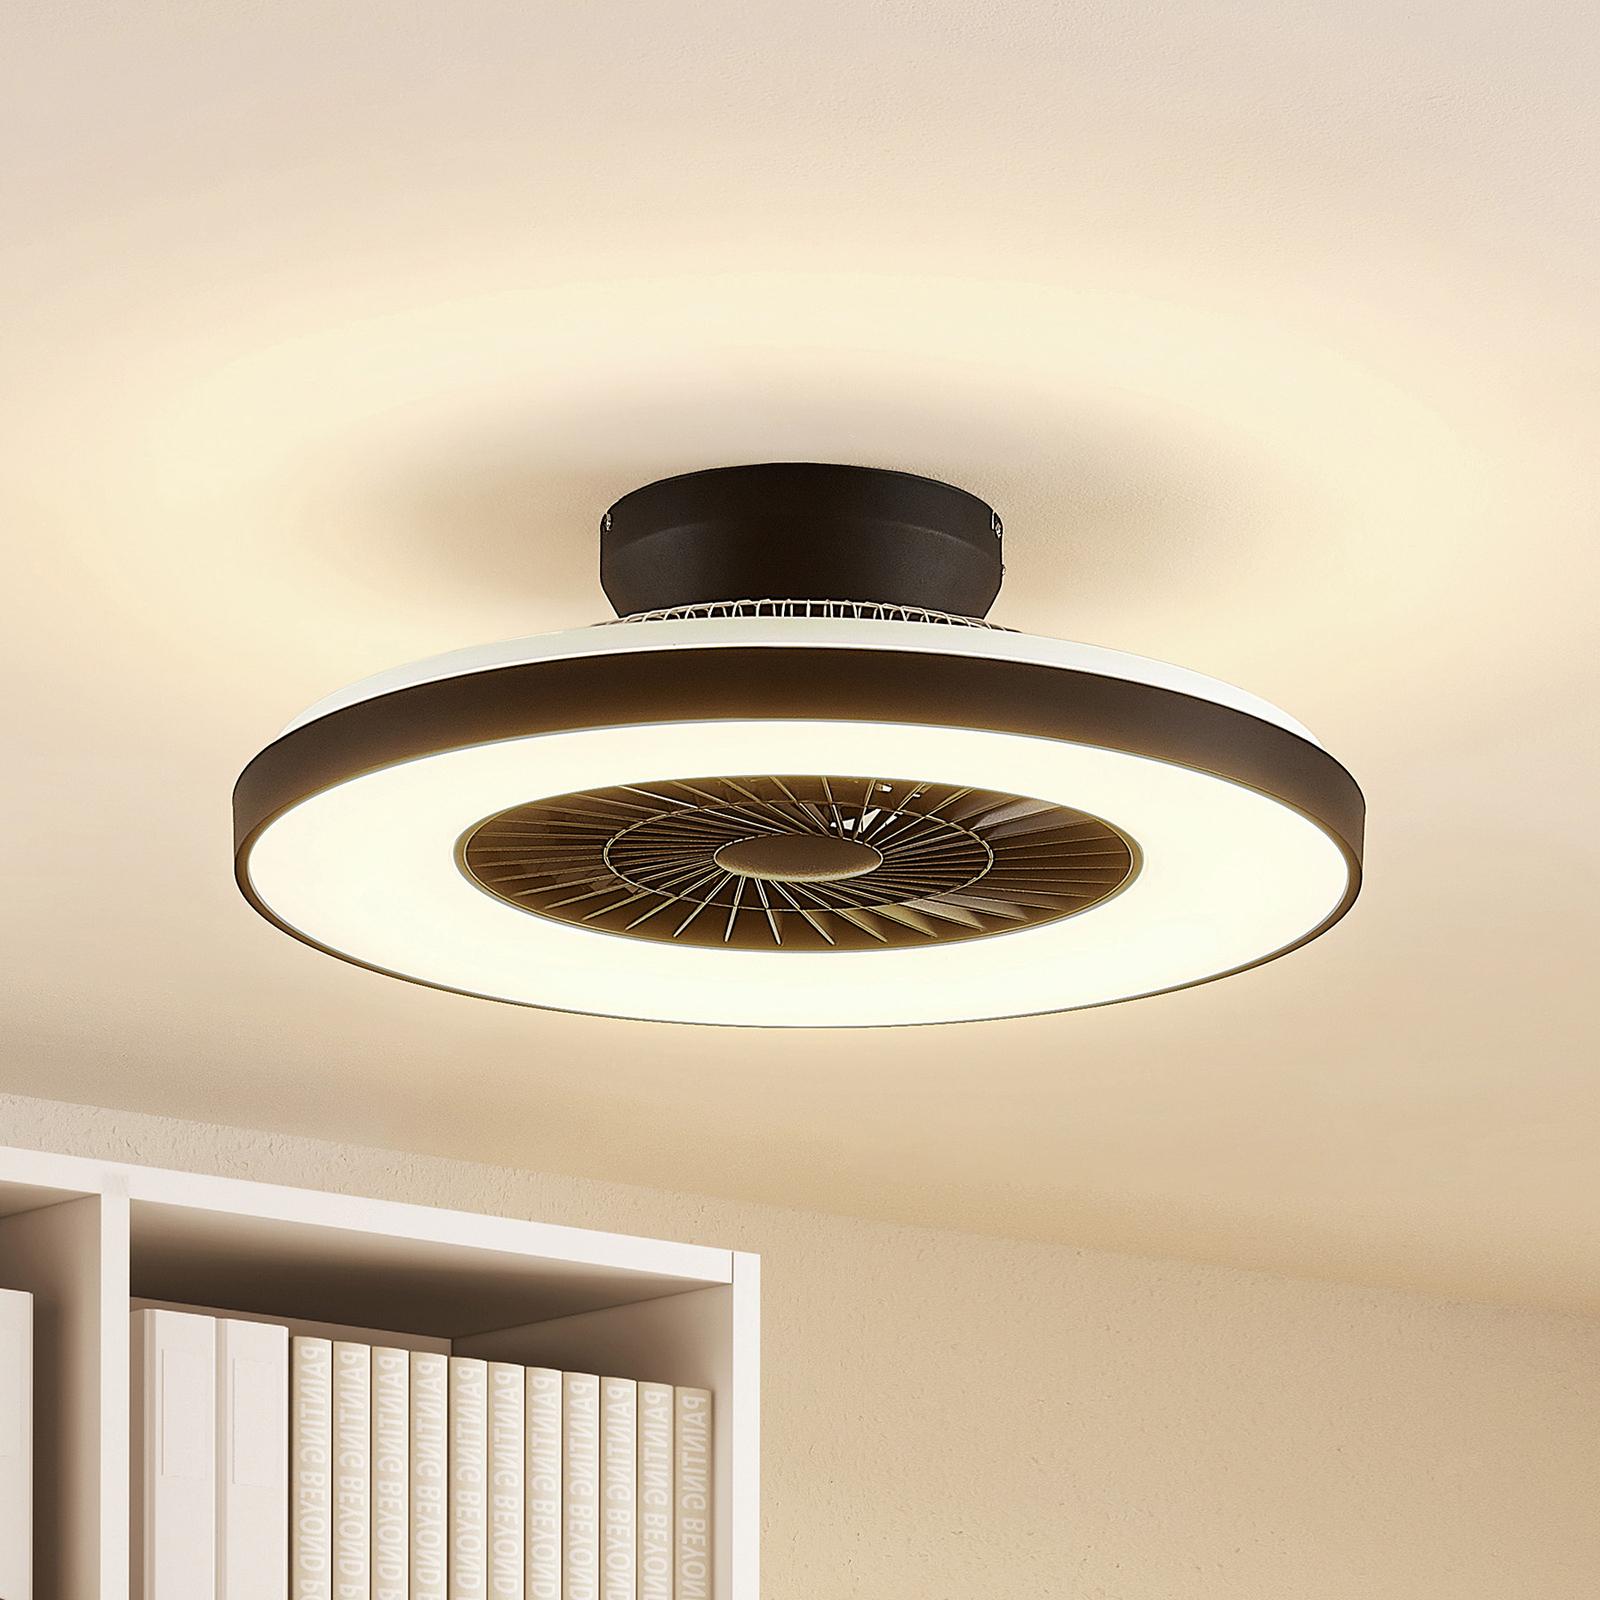 Starluna Orligo LED-Deckenventilator, schwarz matt